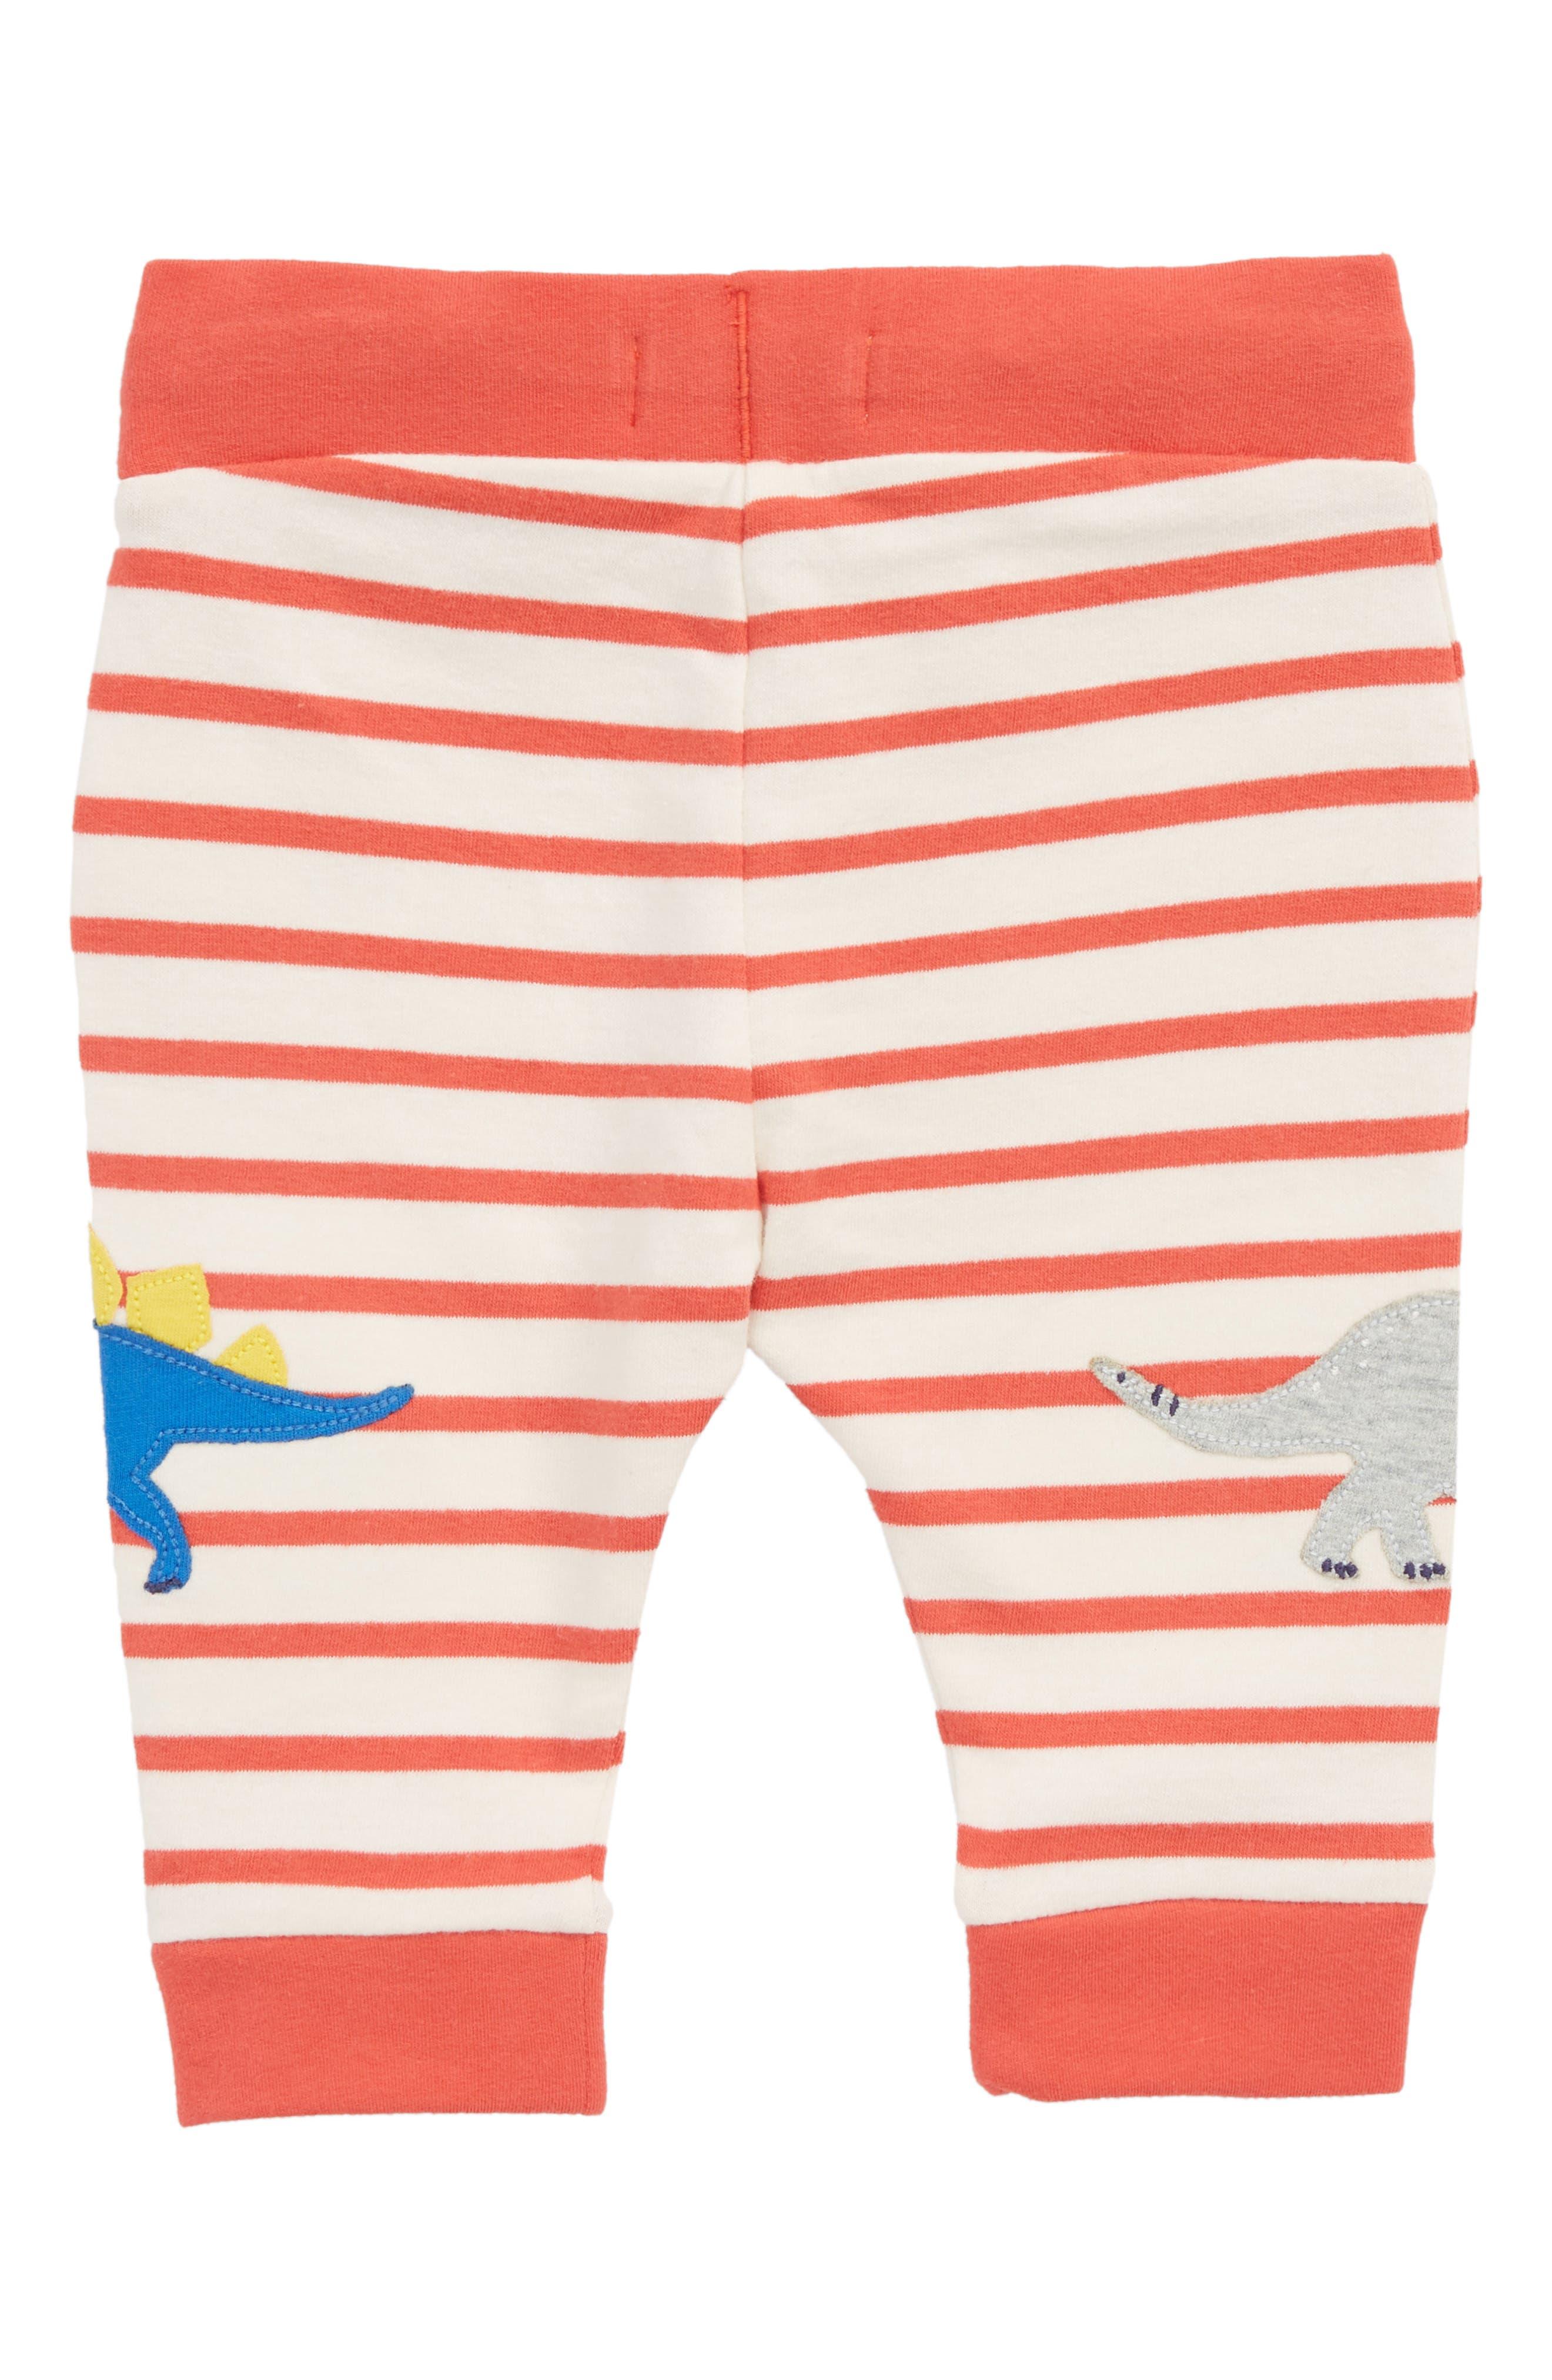 Fun Dino Appliqué Jersey Pants,                             Alternate thumbnail 2, color,                             614